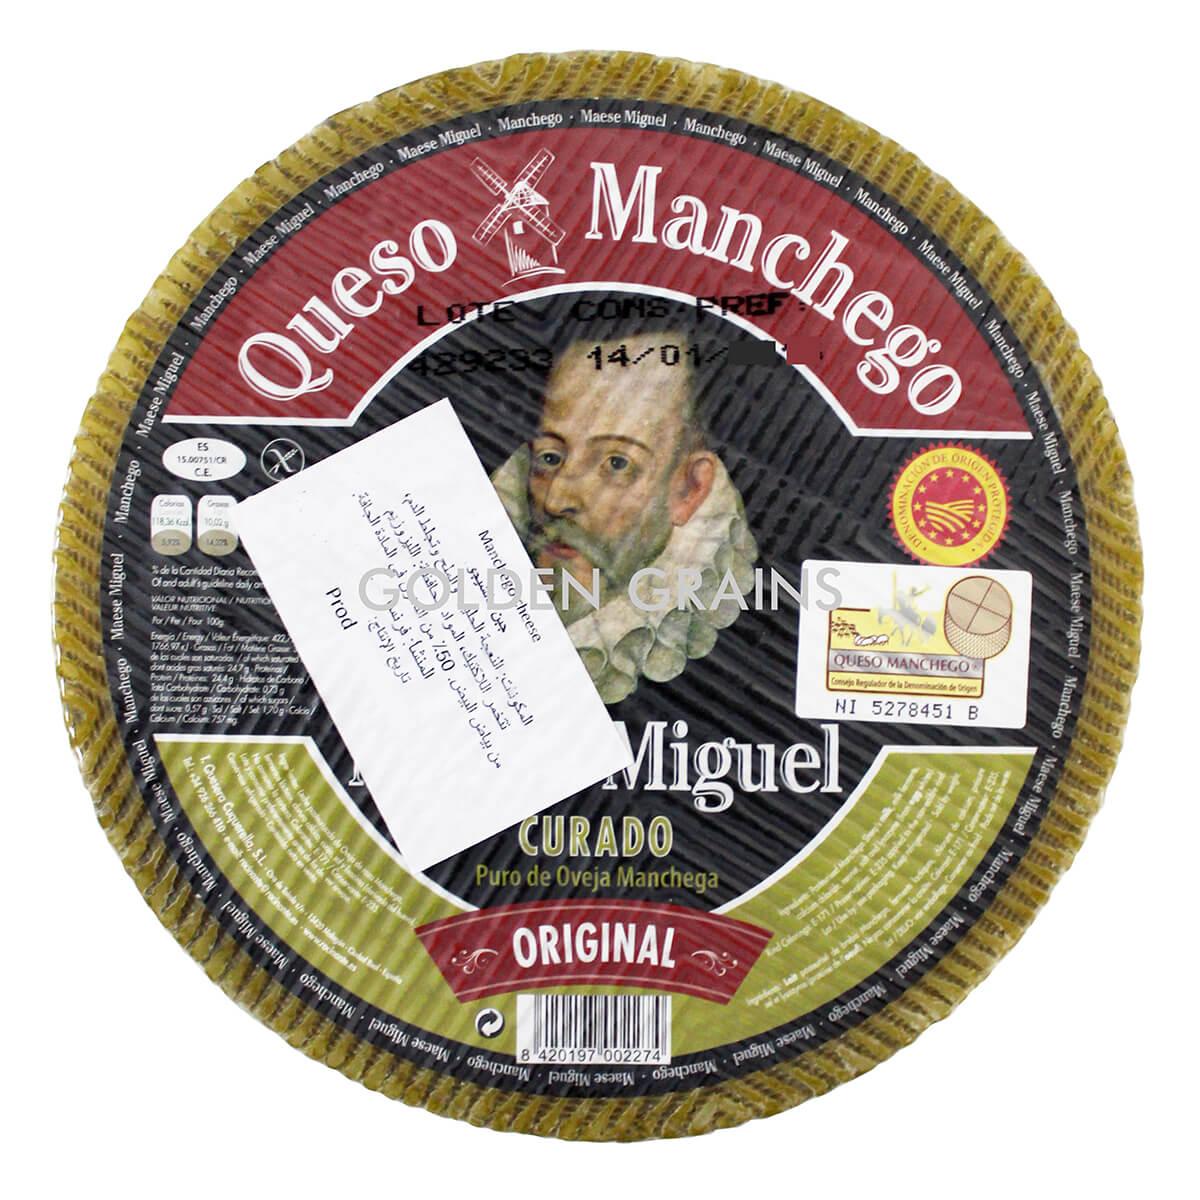 Maes Miguel Manchego